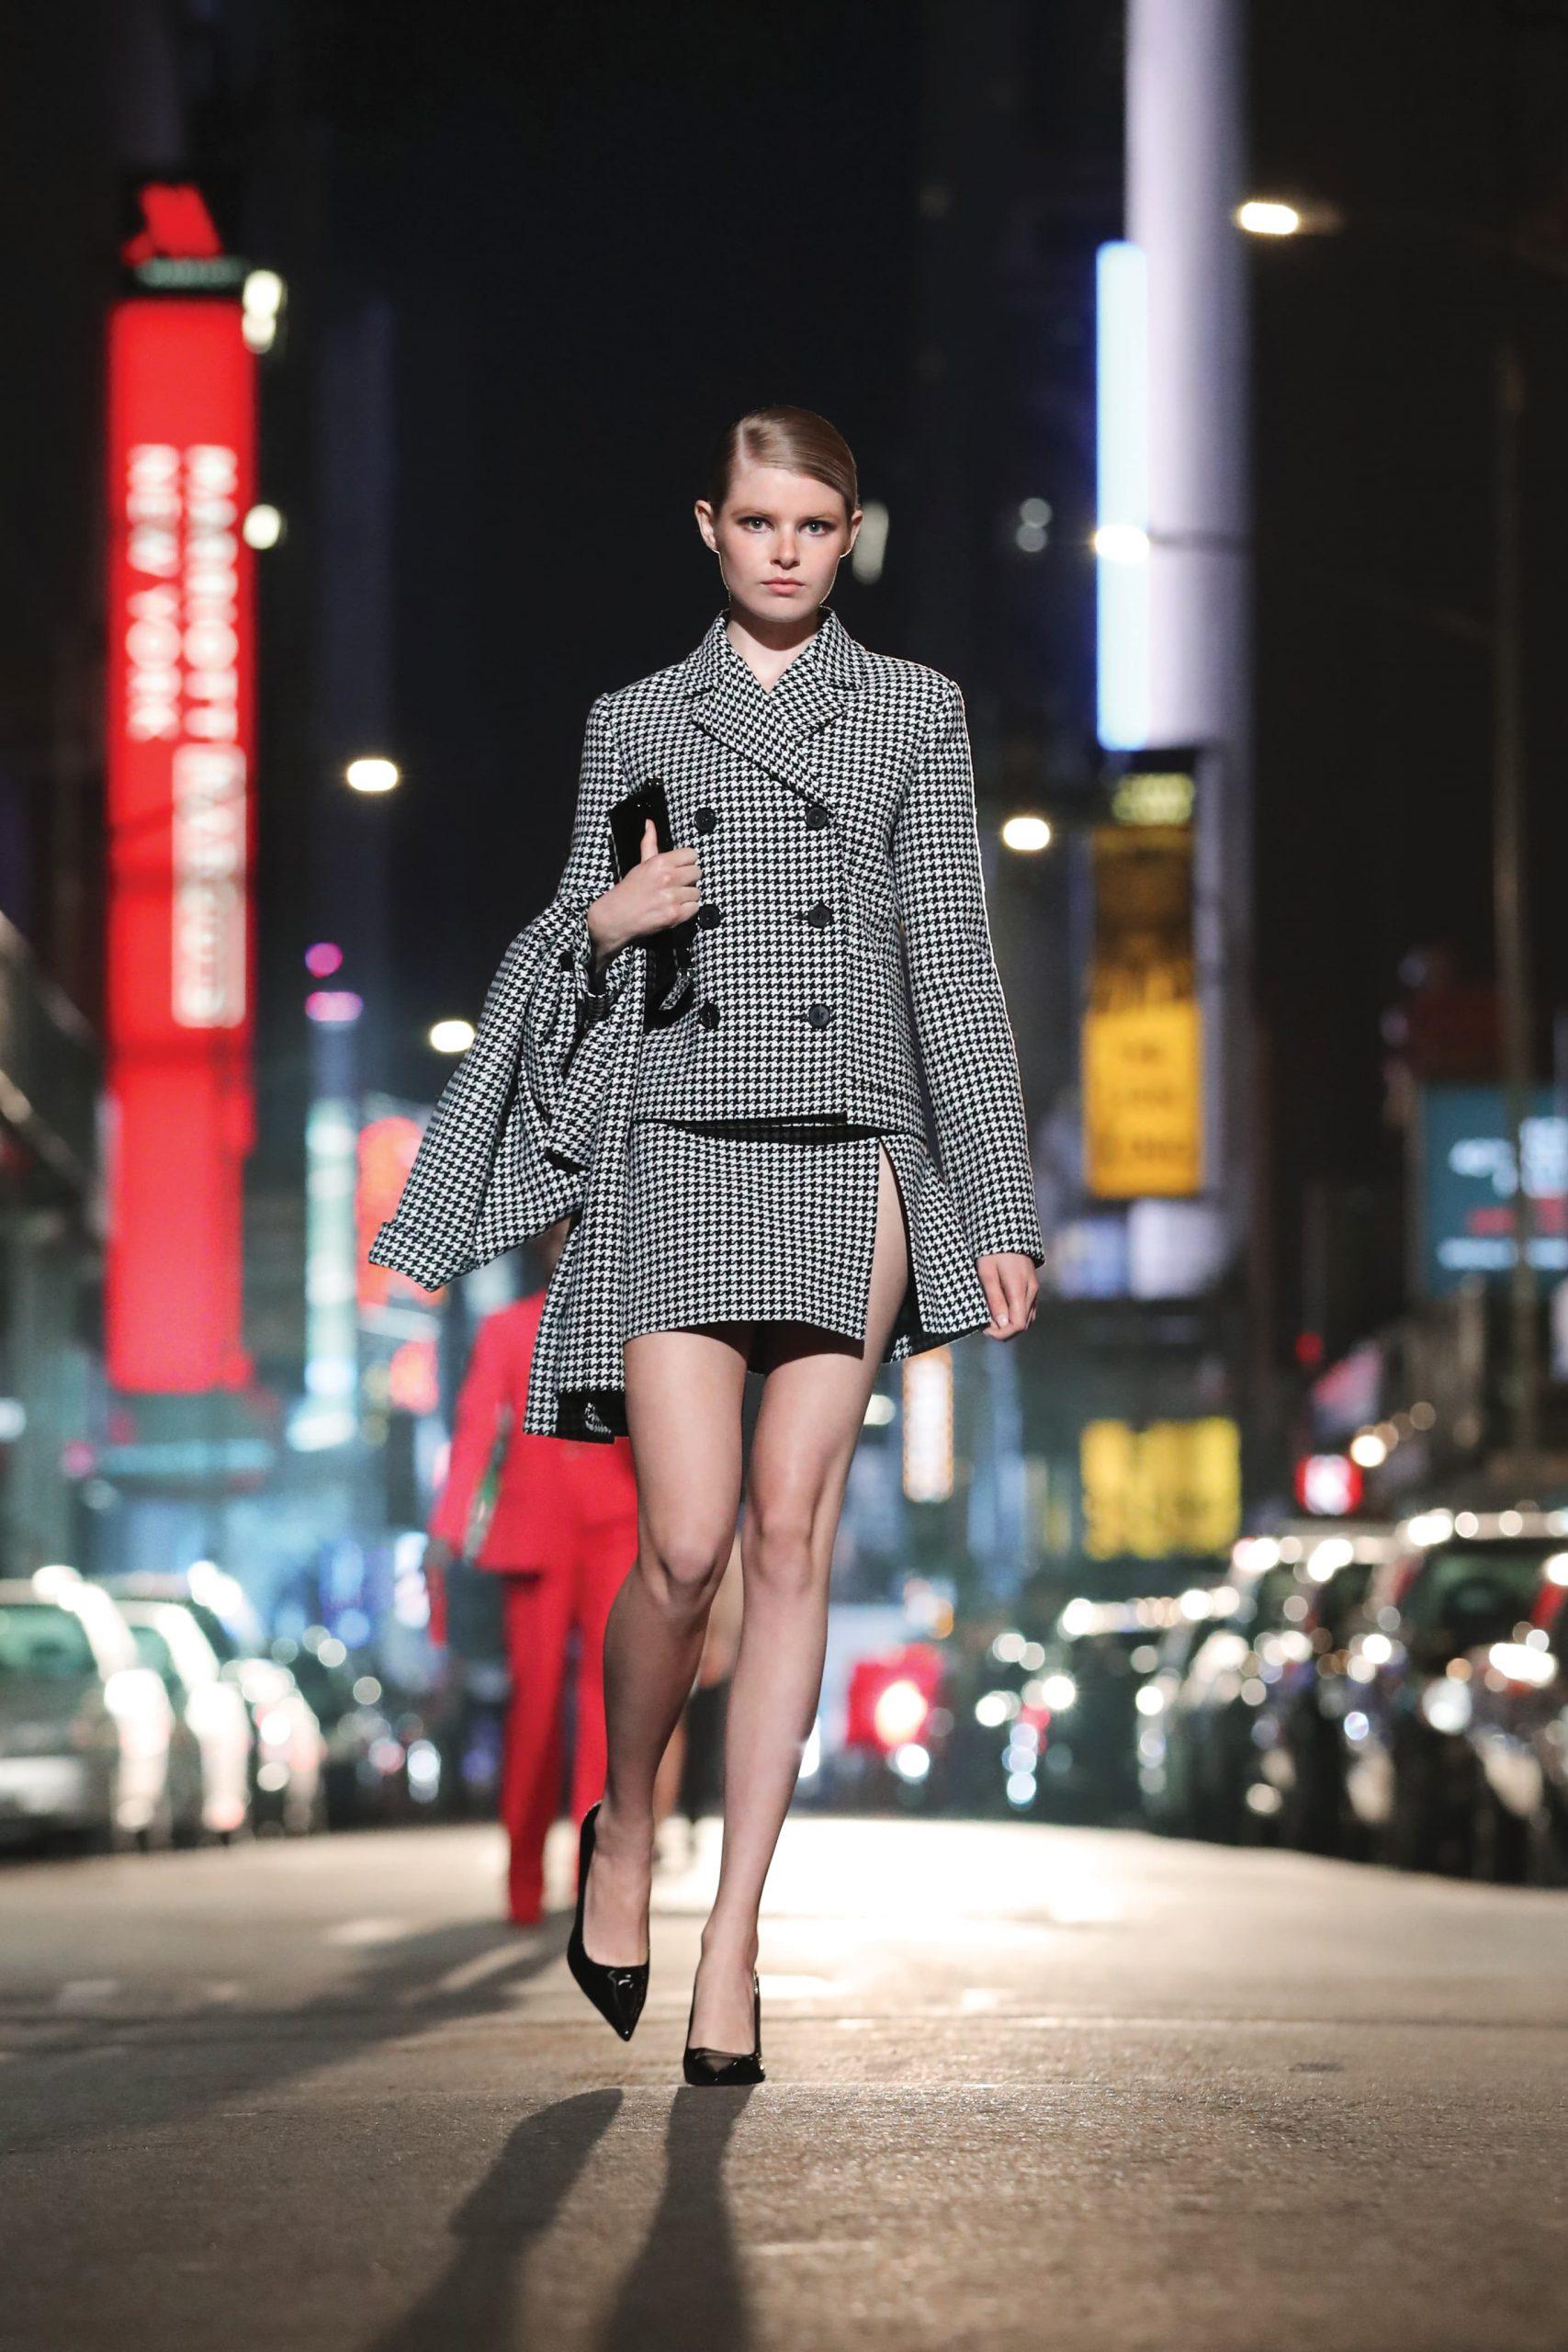 Michael Kors Fall 2021 Fashion Show Review